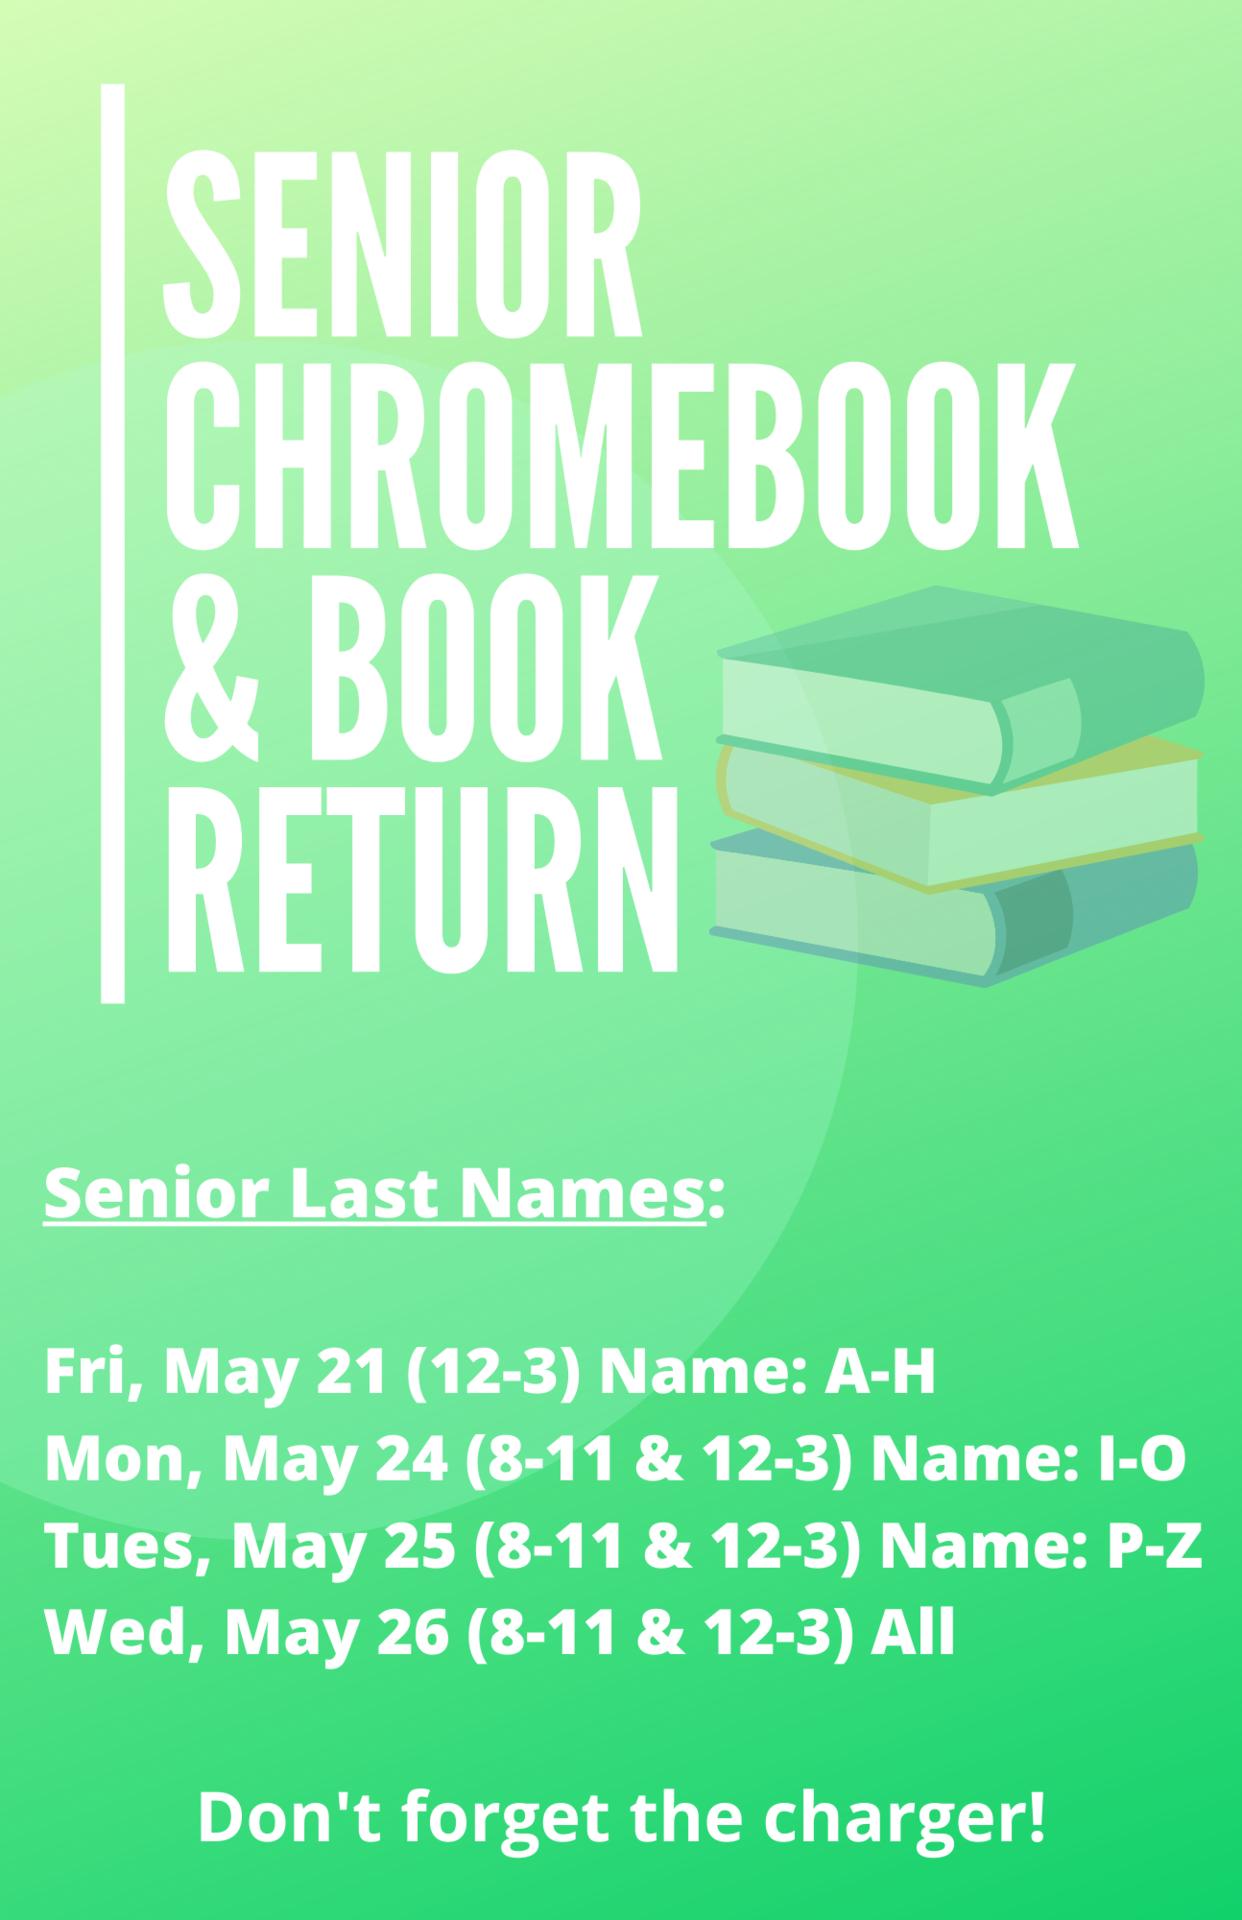 Senior Book Return